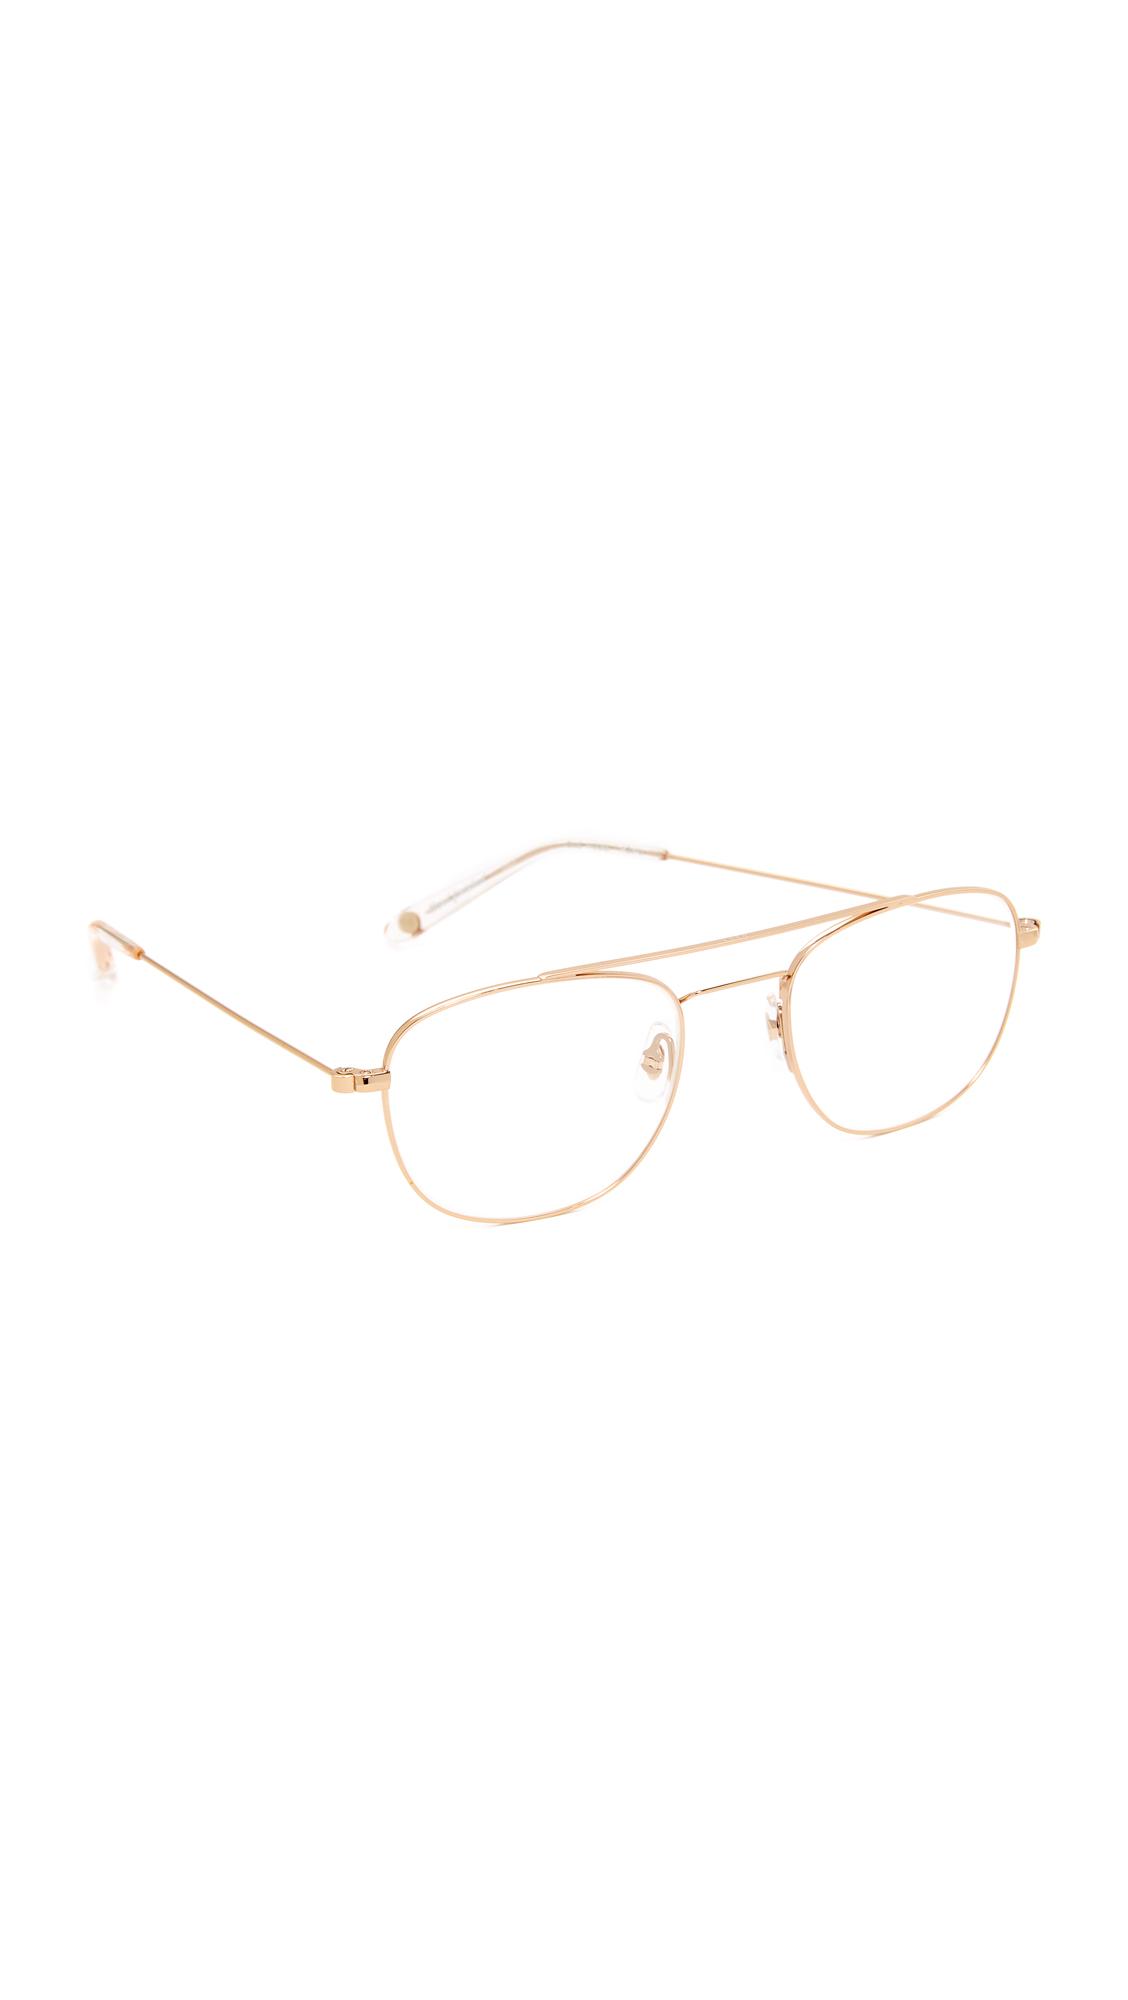 GARRETT LEIGHT Club House Glasses - Gold/Clear